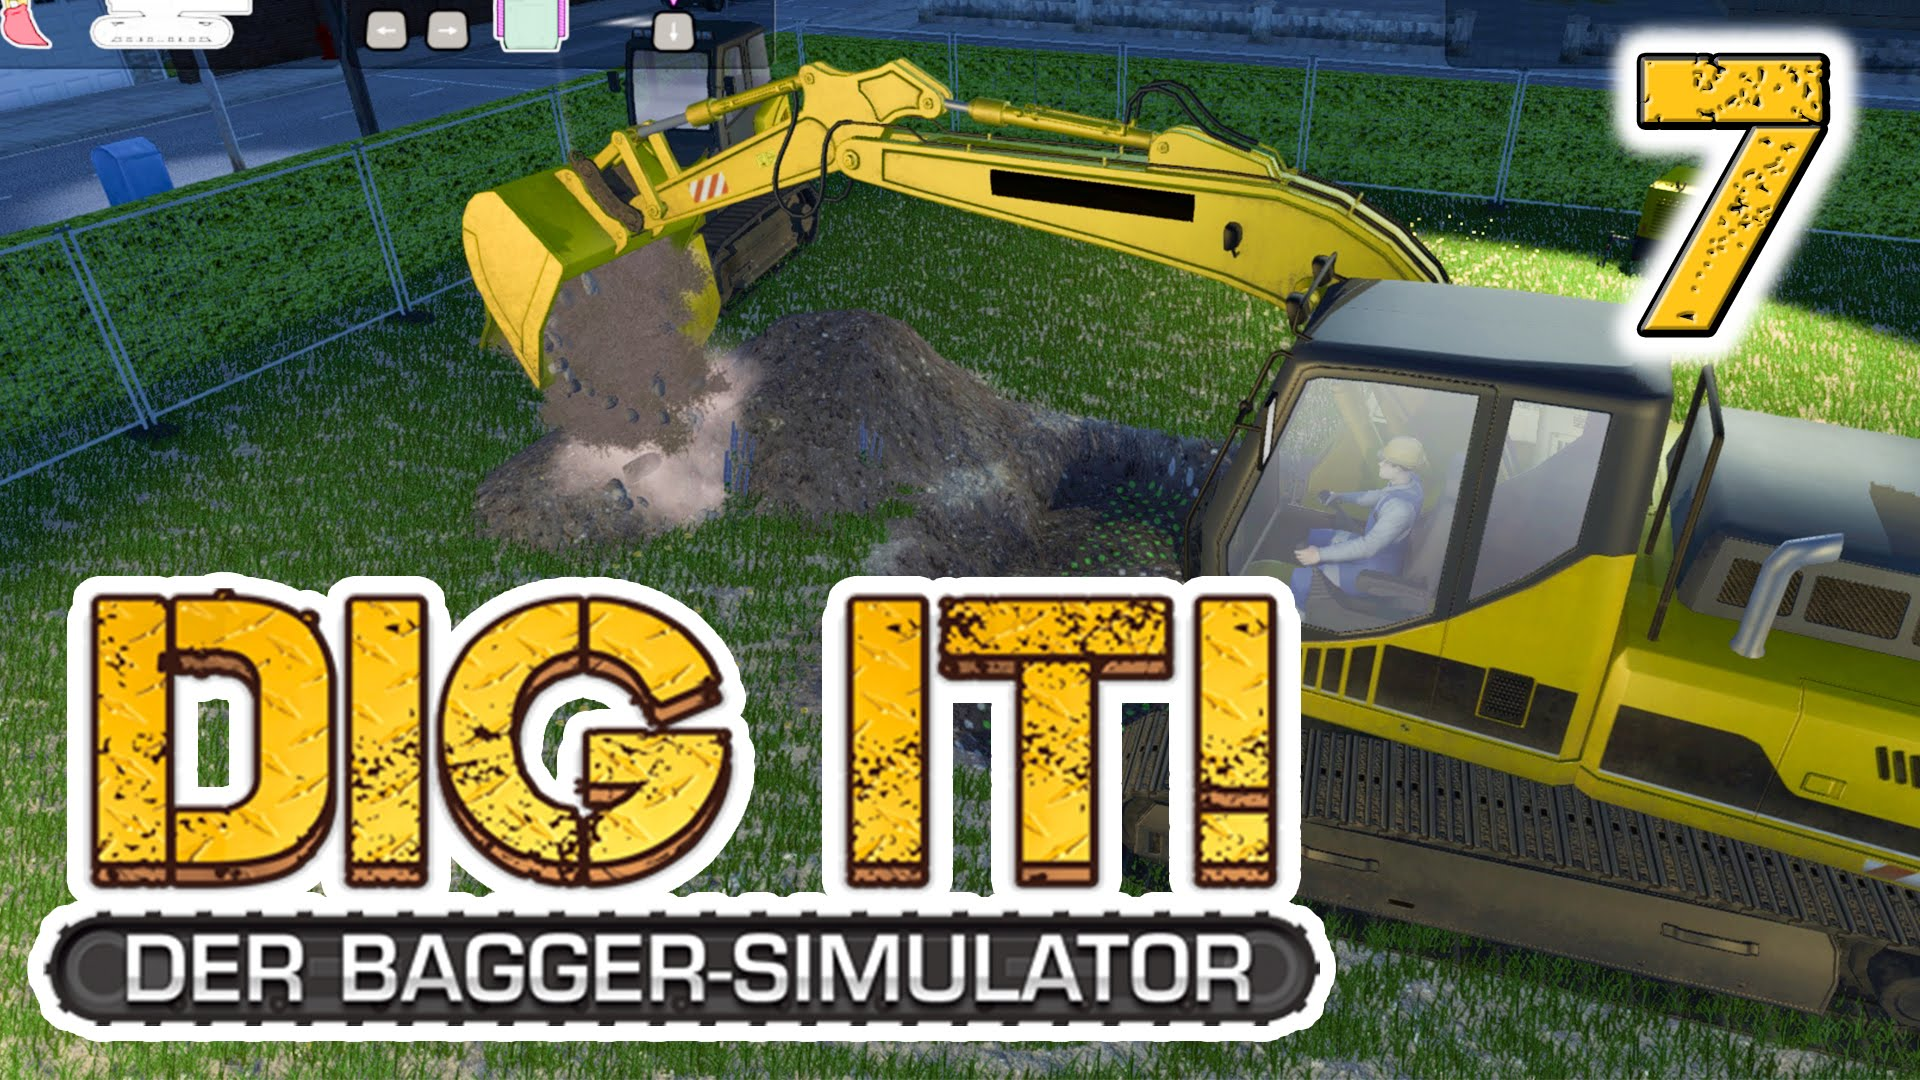 DIG IT! Der Bagger Simulator #7 Eine Geothermalheizung Lets Play DIG IT! Deutsch german